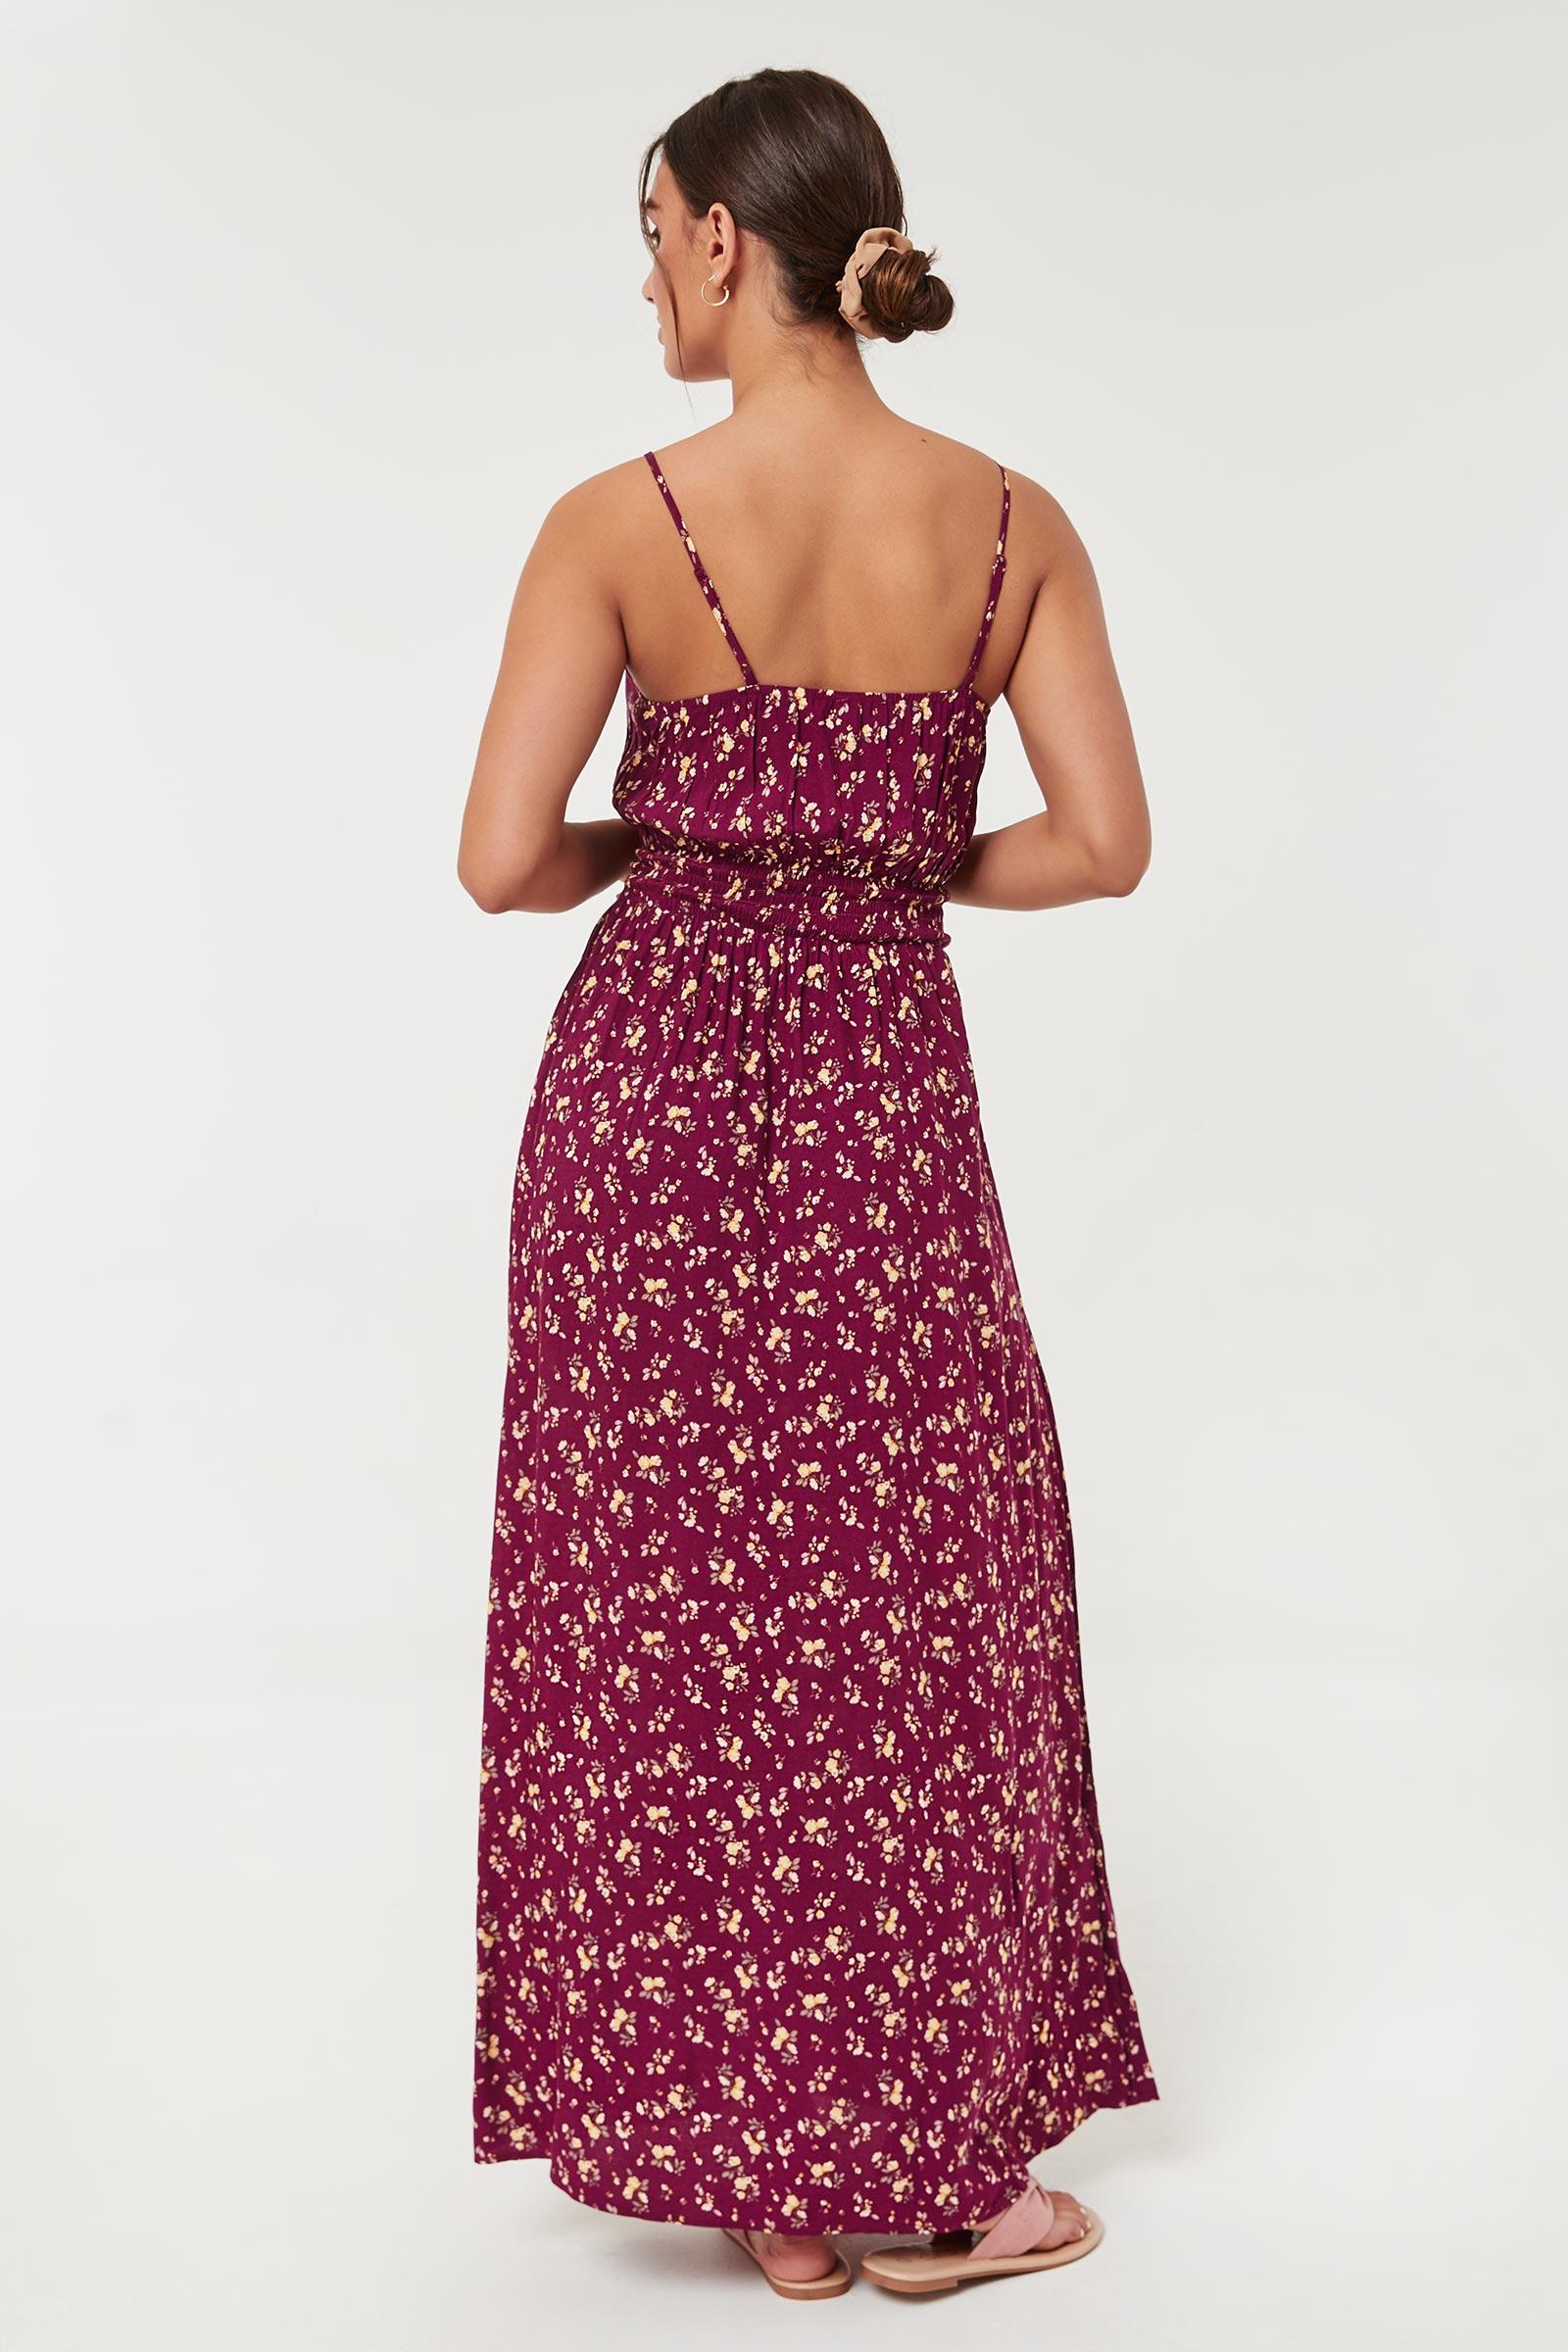 Robe fleurie maxi